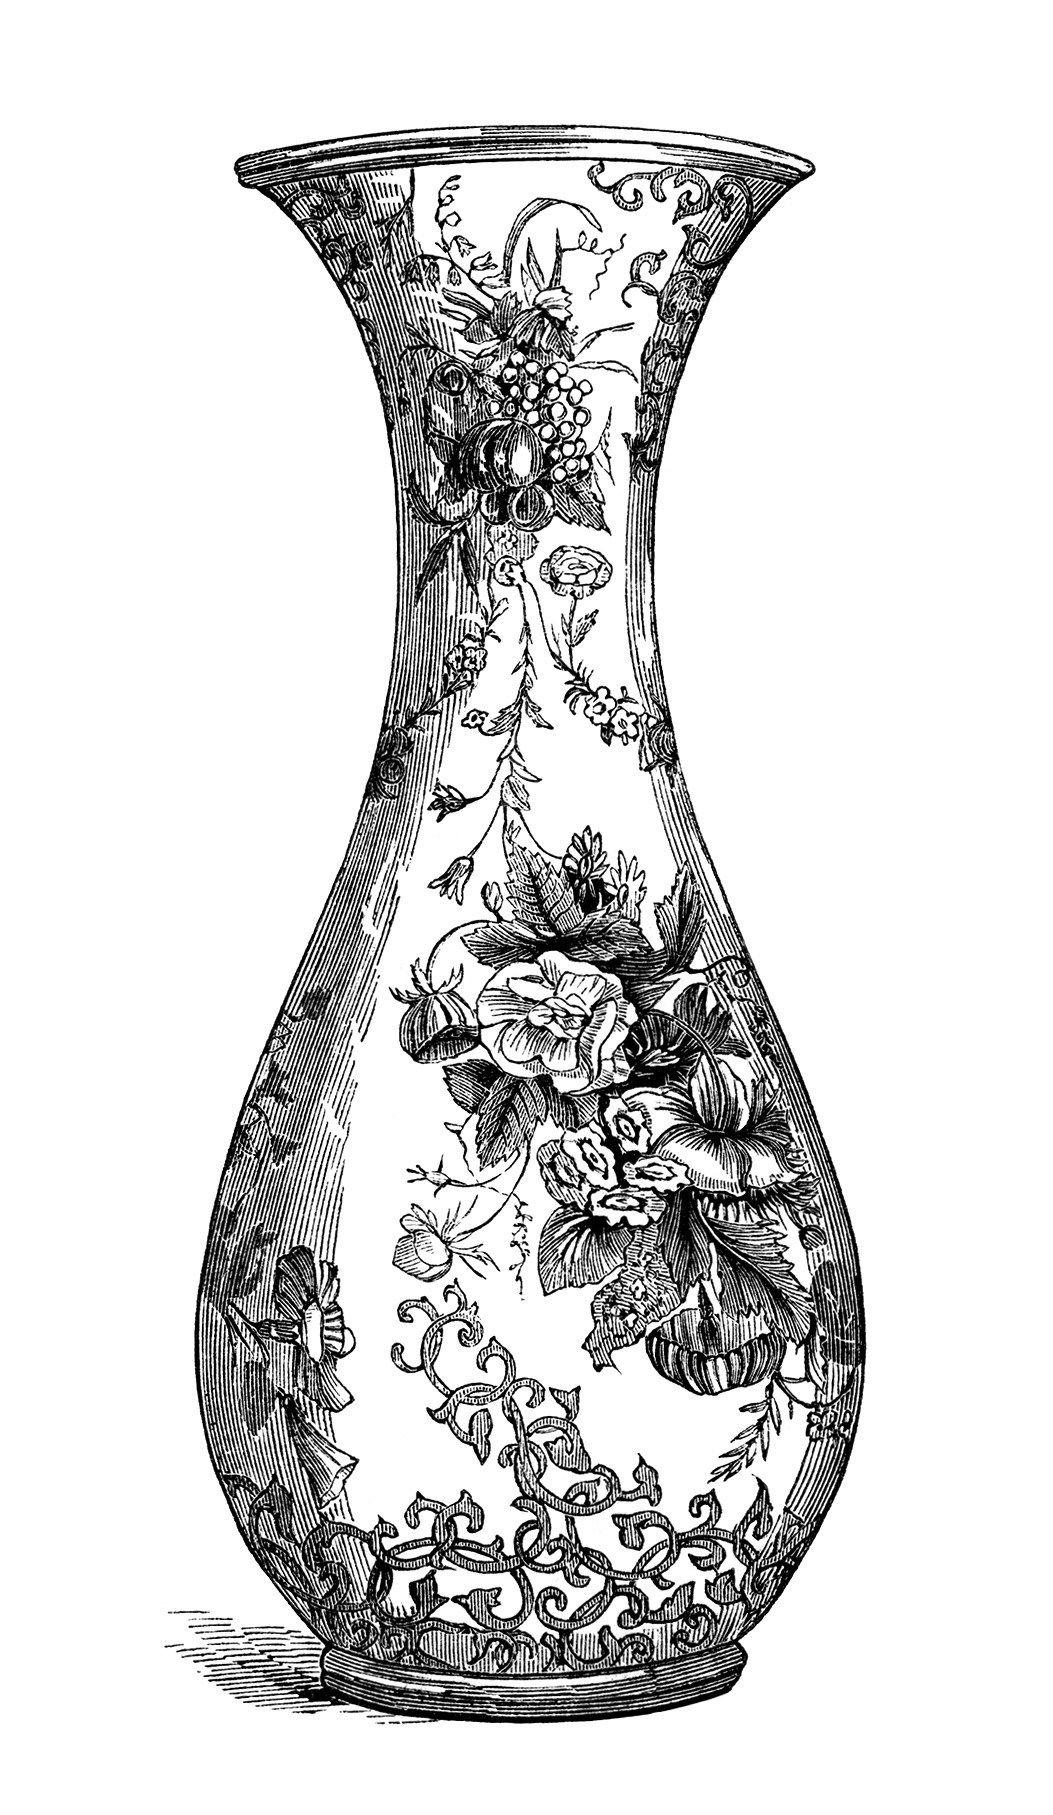 black and white clip art free vintage image floral vase vase  - black and white clip art free vintage image floral vase vase engraving